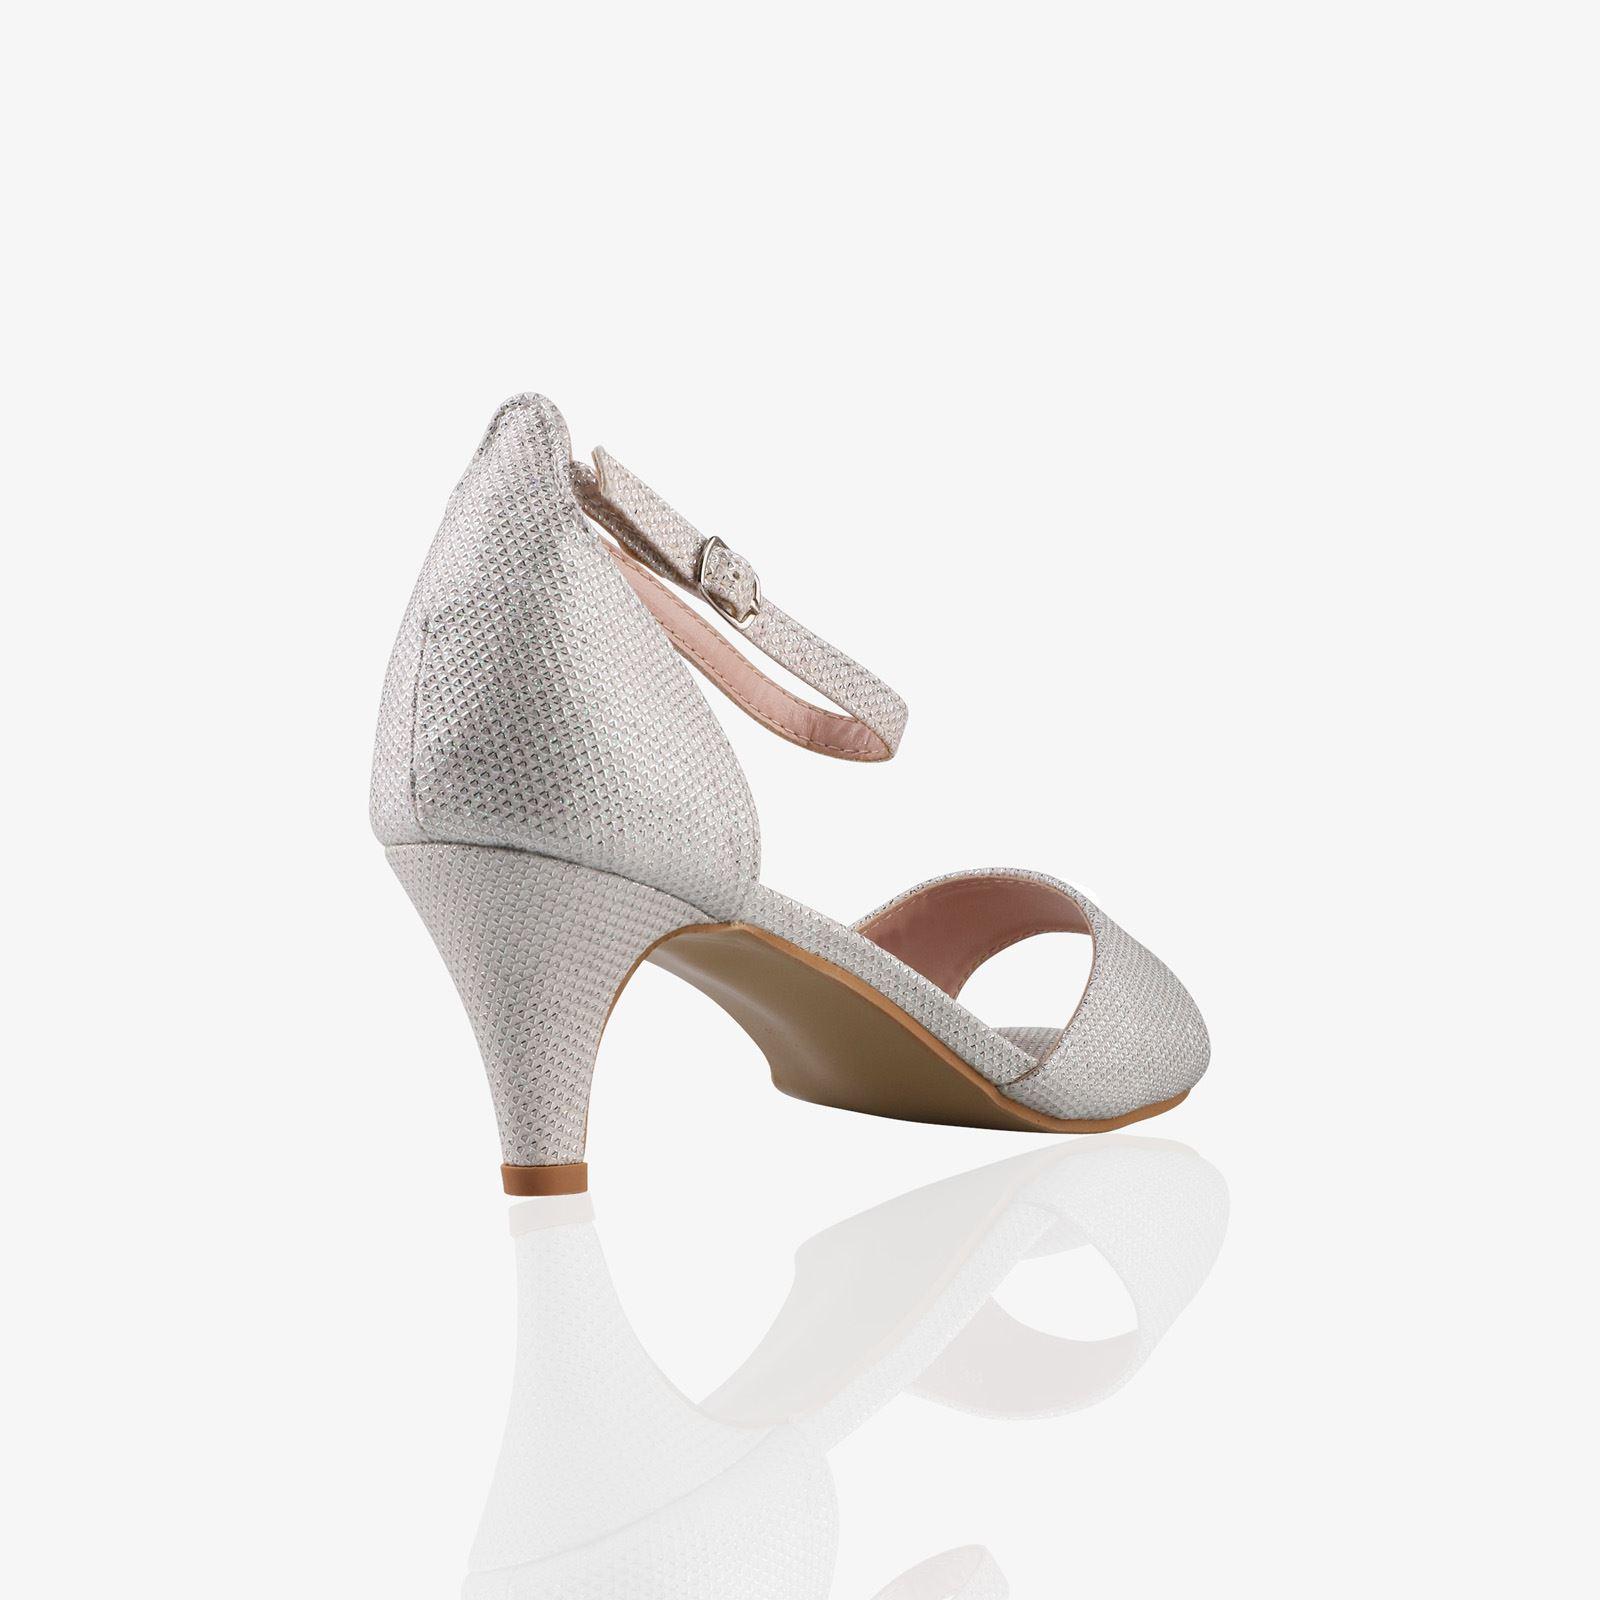 Women-Ladies-Low-Kitten-Heel-Court-Shoes-Open-Toe-Glitter-Sandals-Party-Bridal thumbnail 19